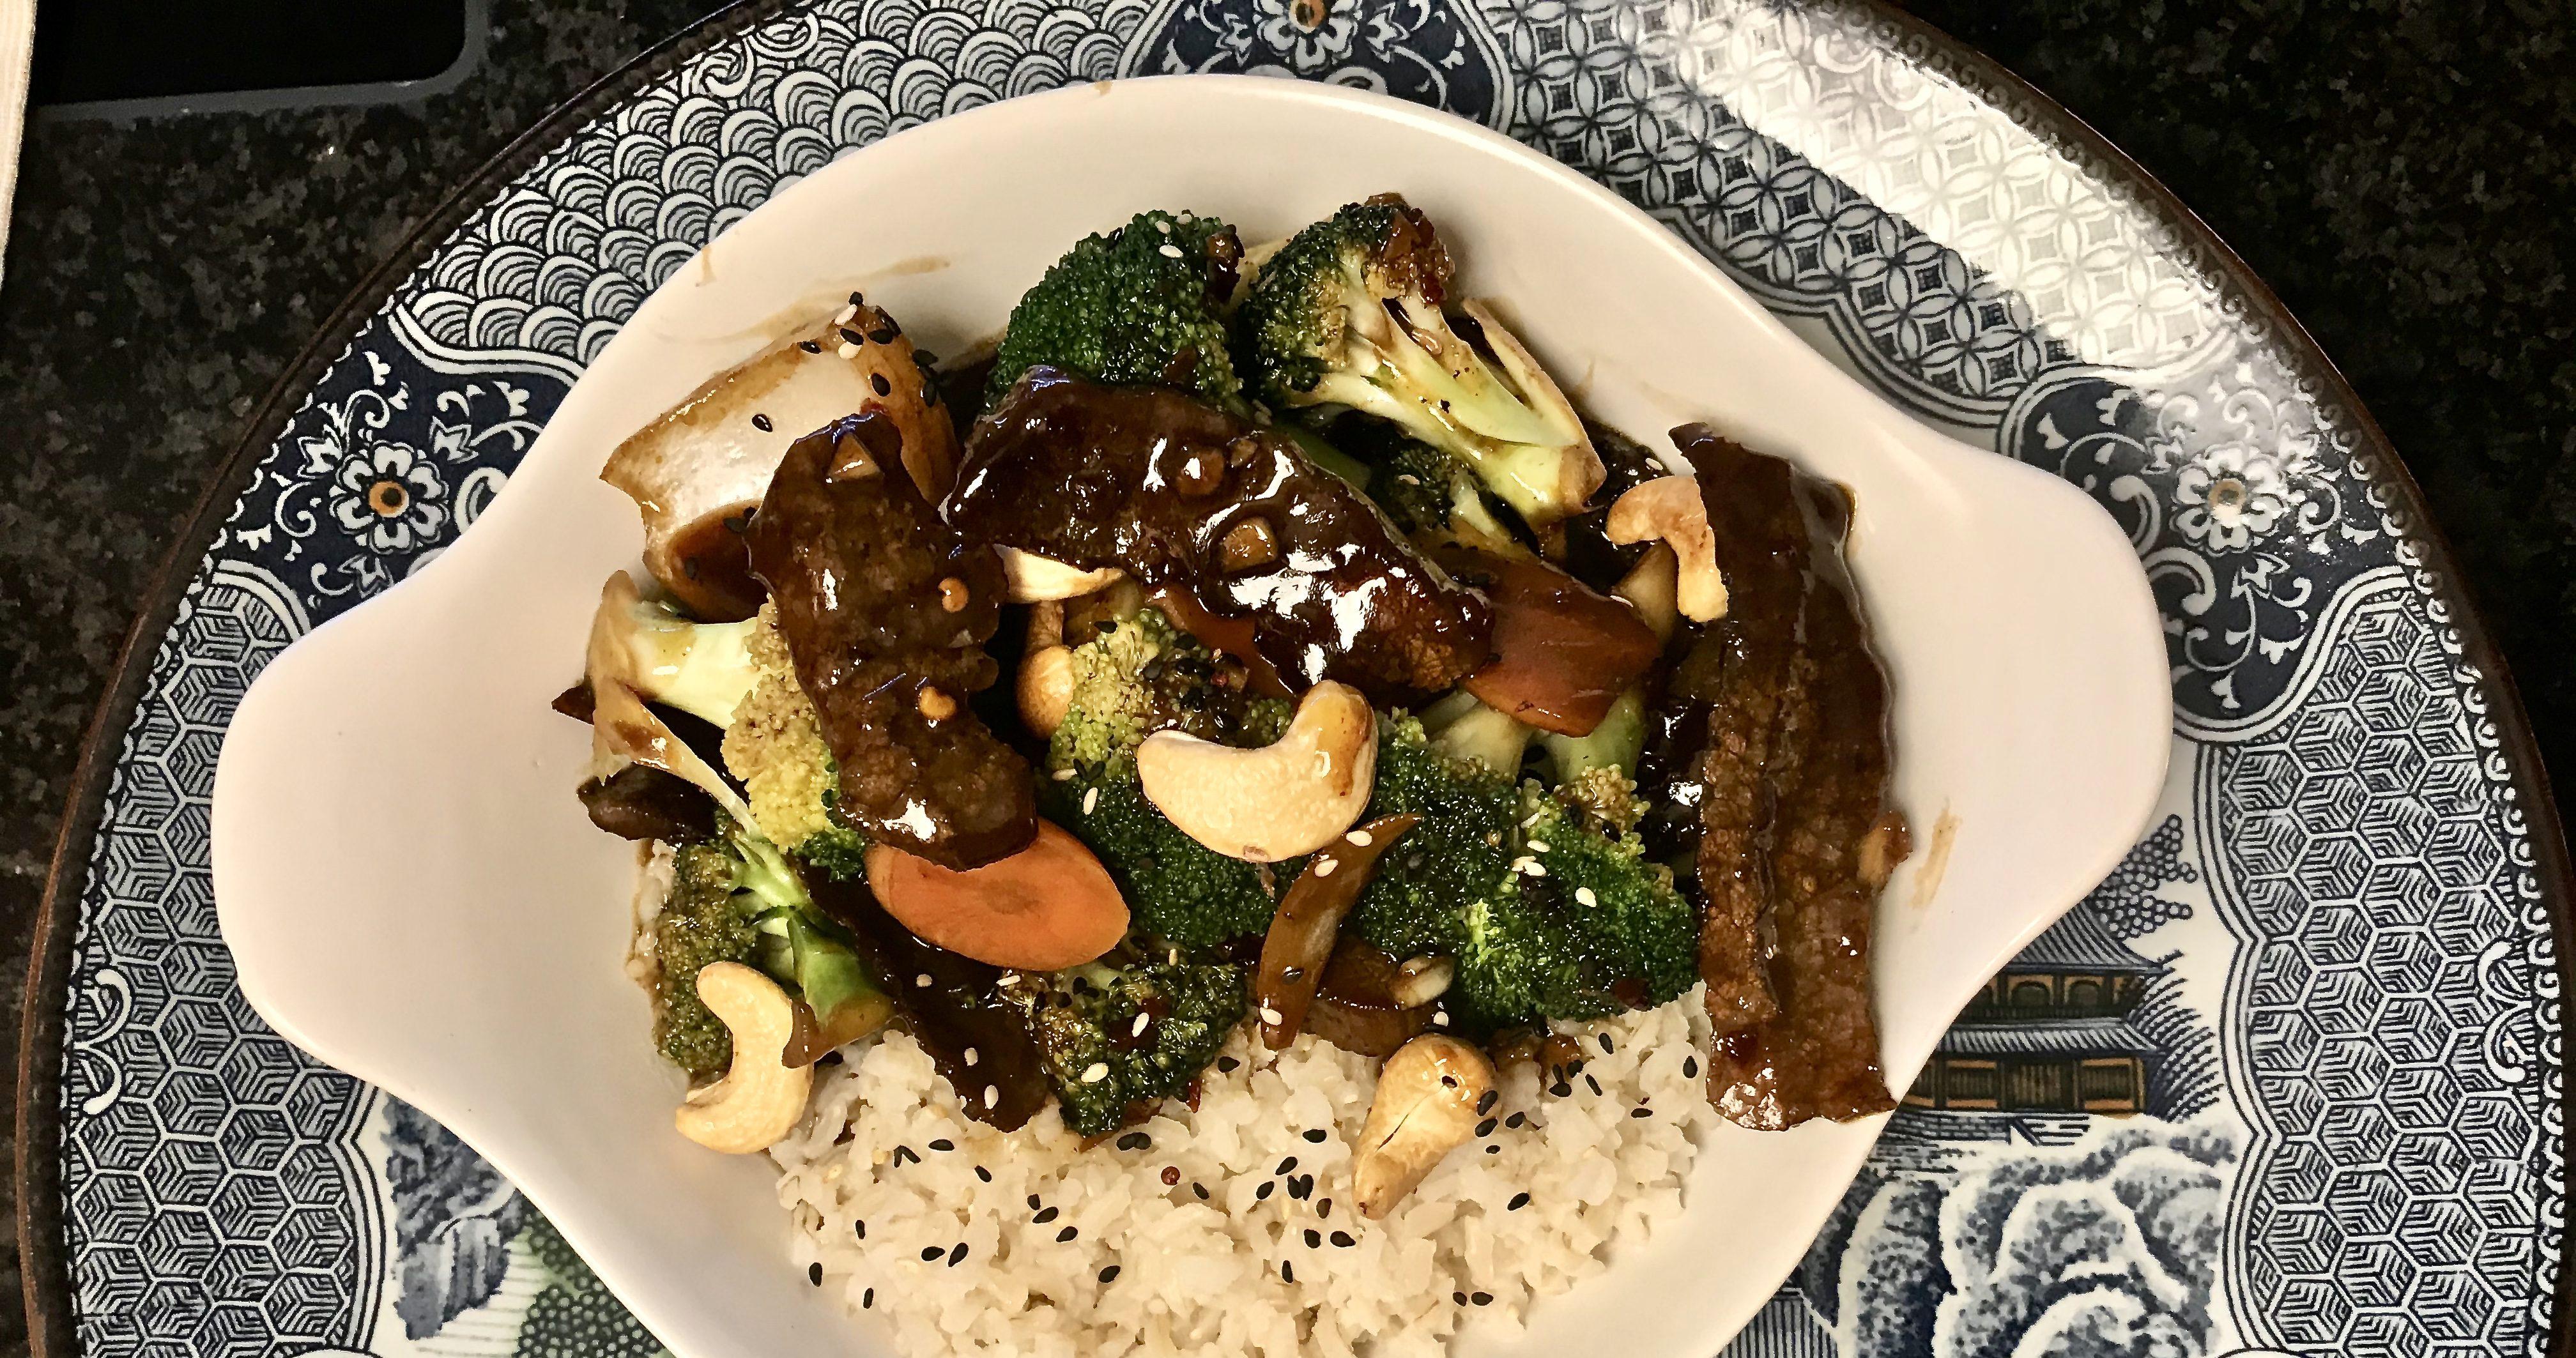 Savory Broccoli Beef